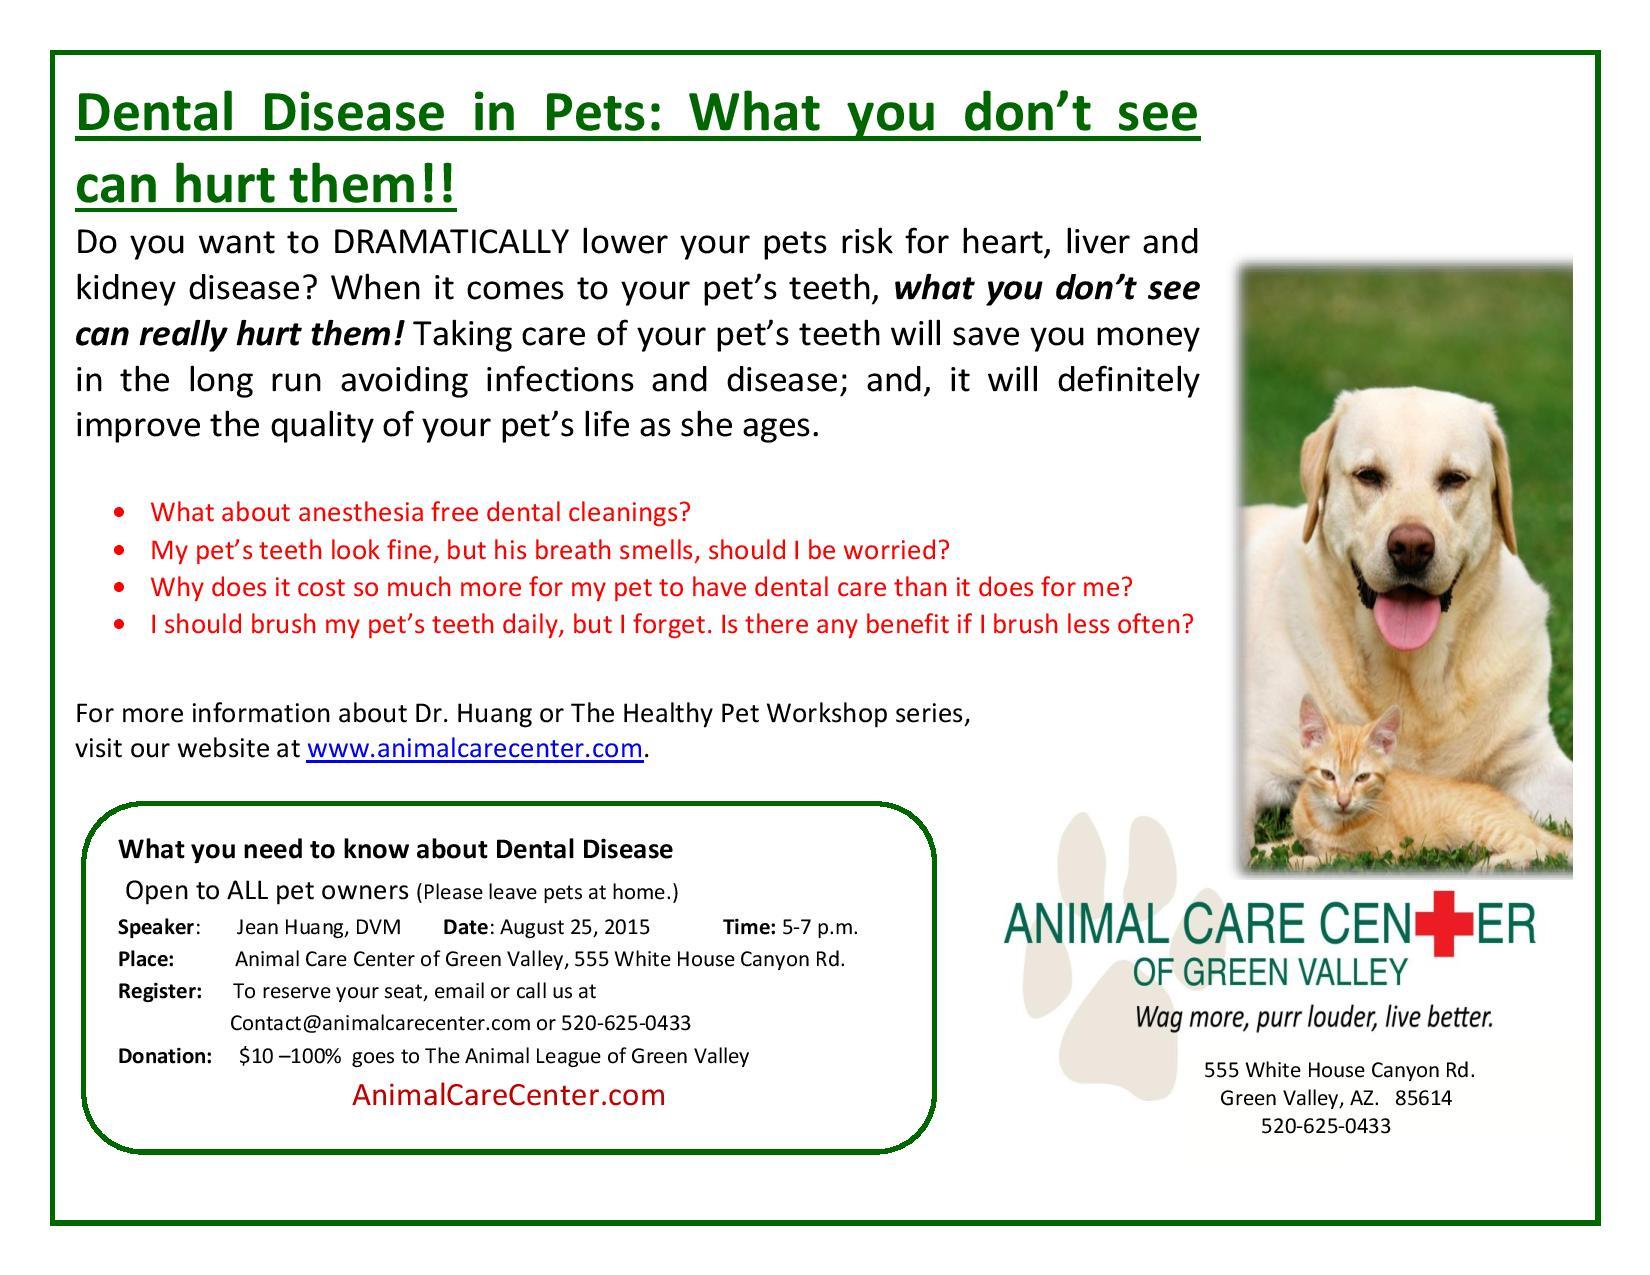 07-15 Animal Care Center of GV PROOF-JPEG